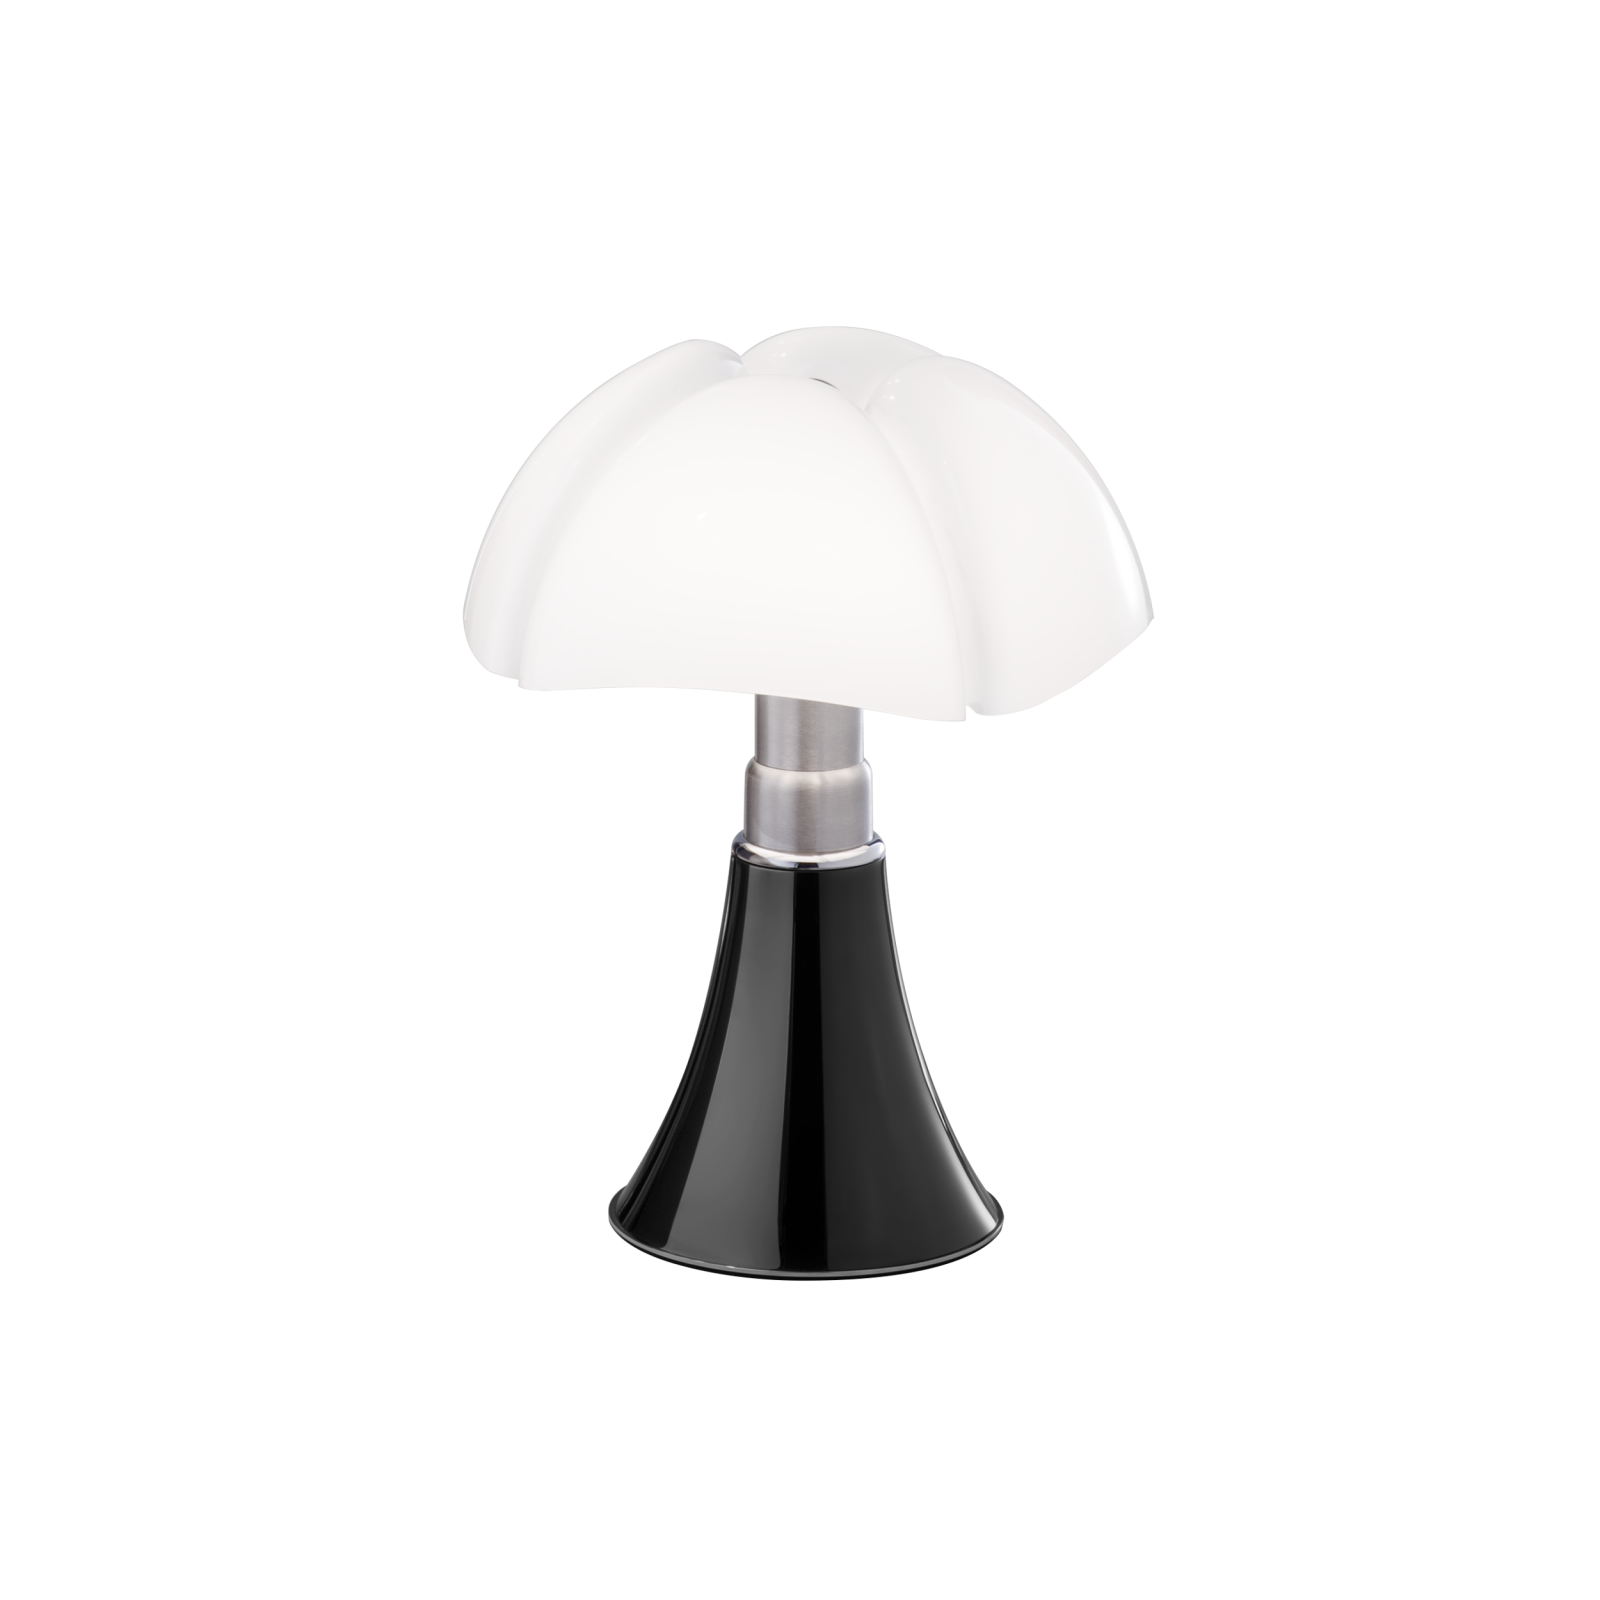 lampe poser mini pipistrello led tactile dimmable de. Black Bedroom Furniture Sets. Home Design Ideas